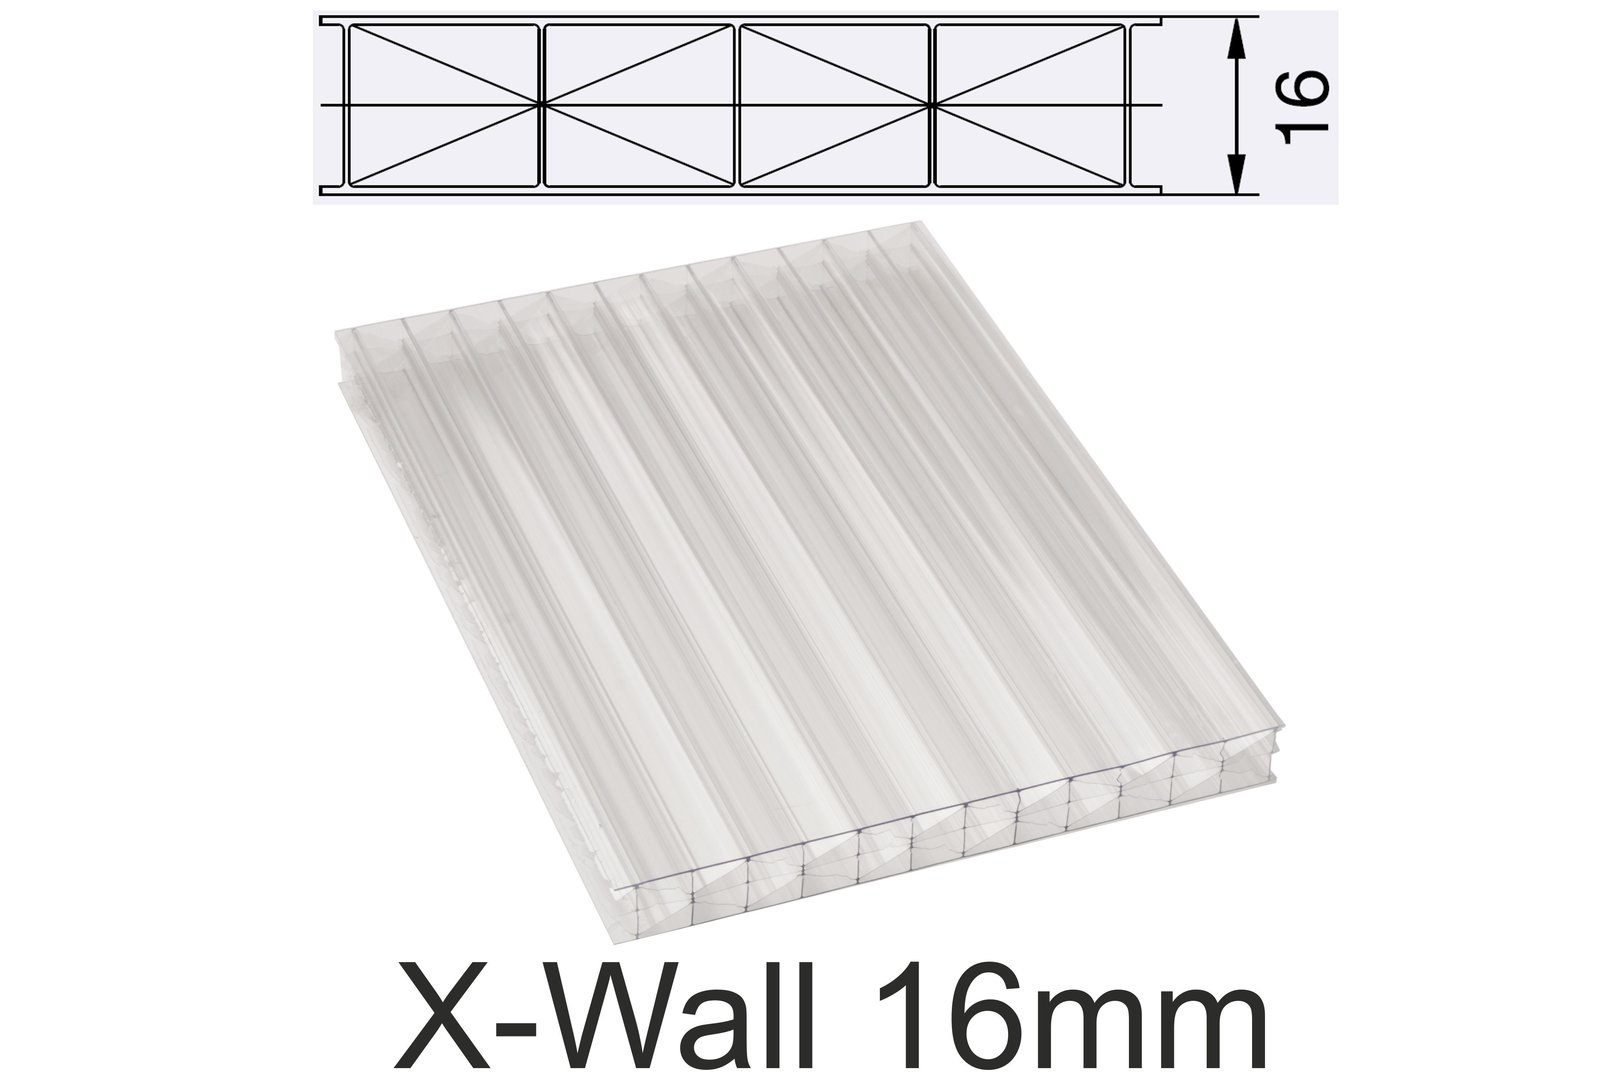 16mm hohlkammerplatten x wall klar marlon polycarbonat stegplatte. Black Bedroom Furniture Sets. Home Design Ideas